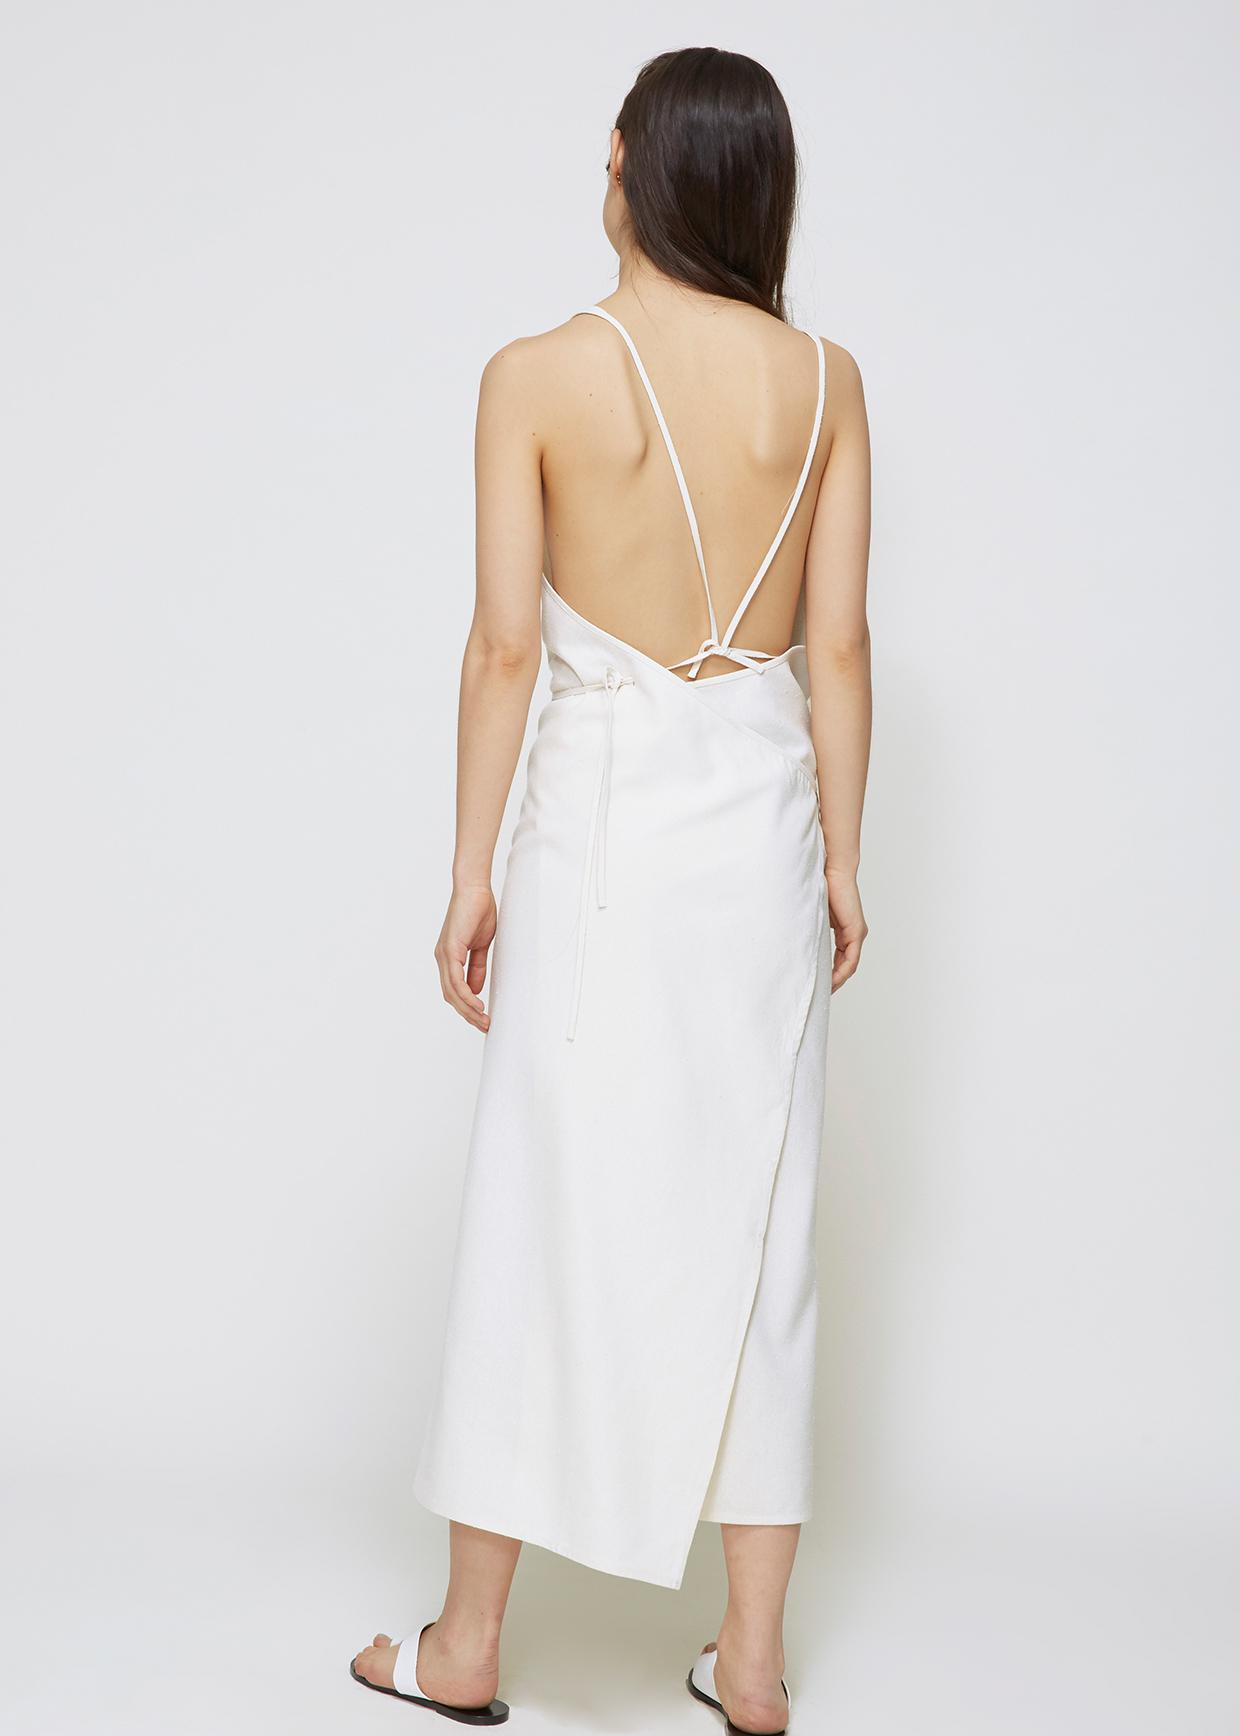 0aeb2fbd955 Baserange Apron Dress in White - Lyst